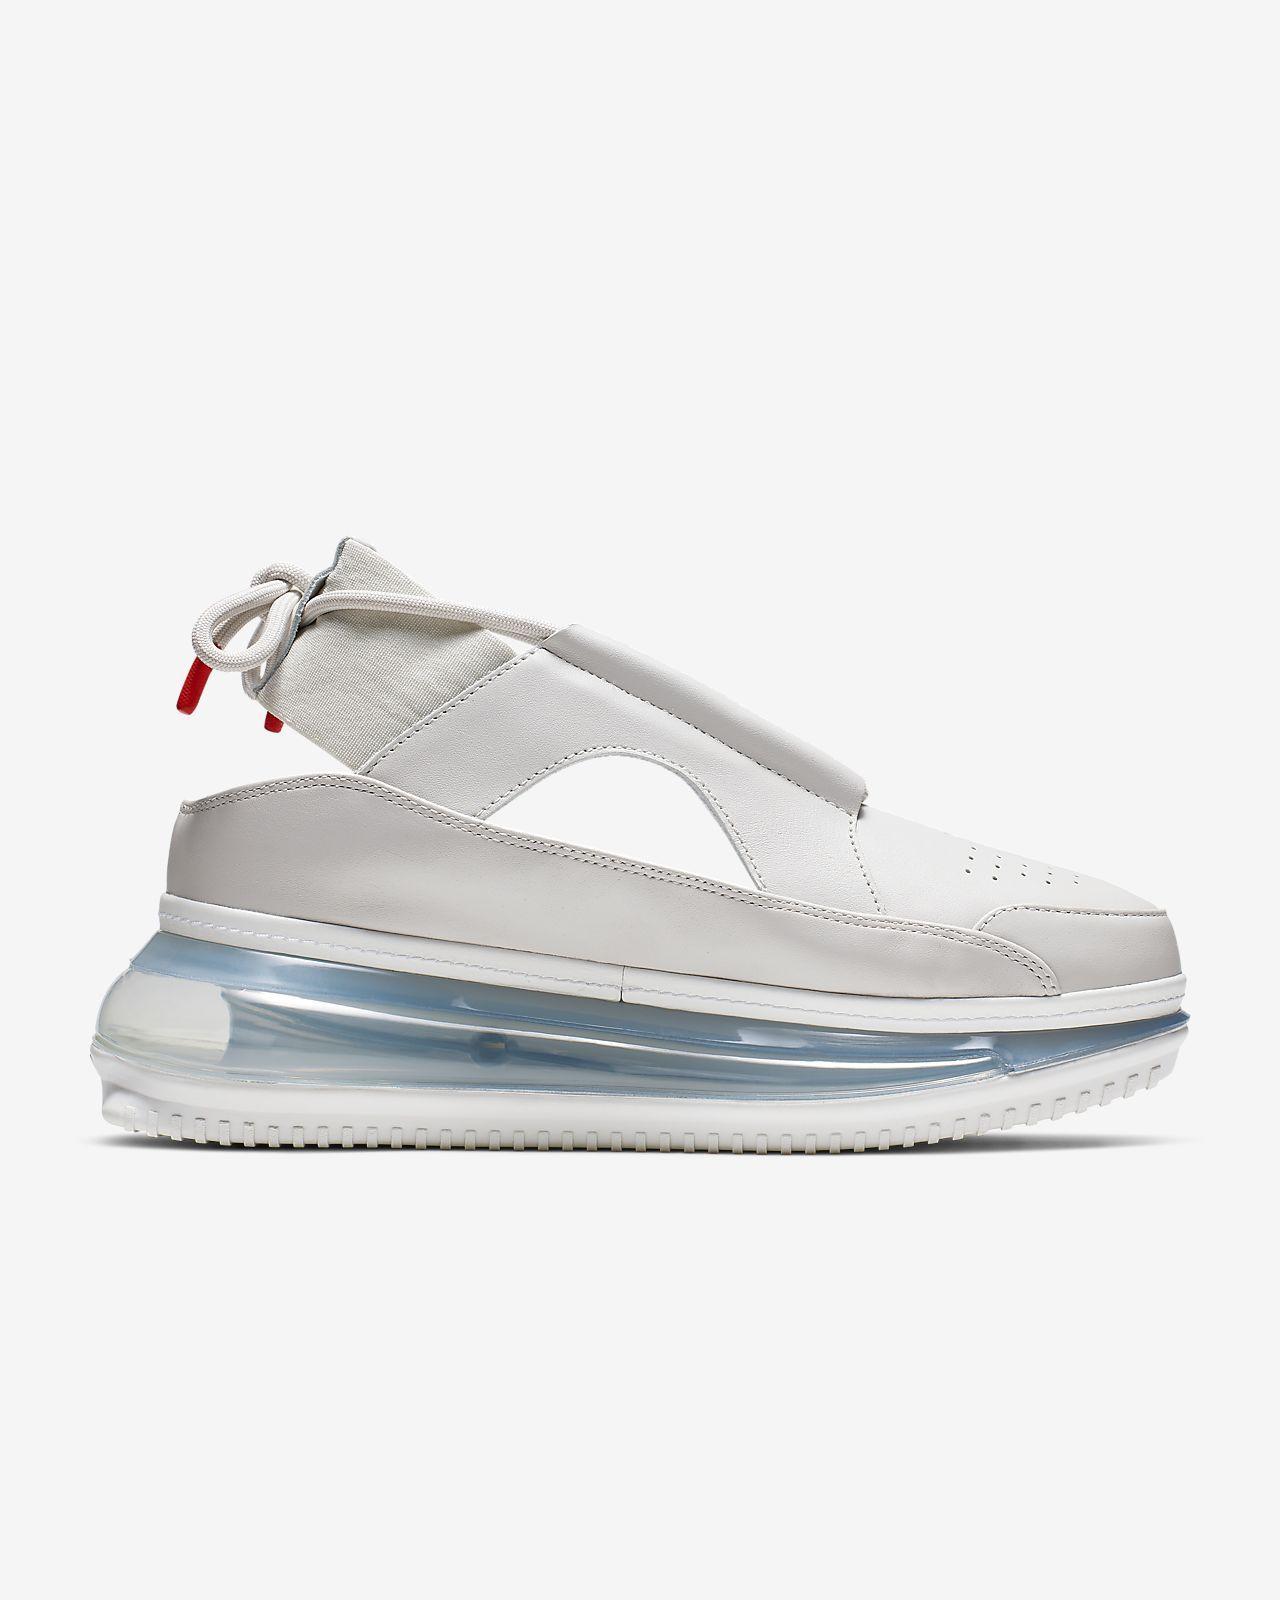 Nike Air Max Ff 720 Women S Shoe Nike Com Nike Shoes Women Nike Air Max Women Shoes